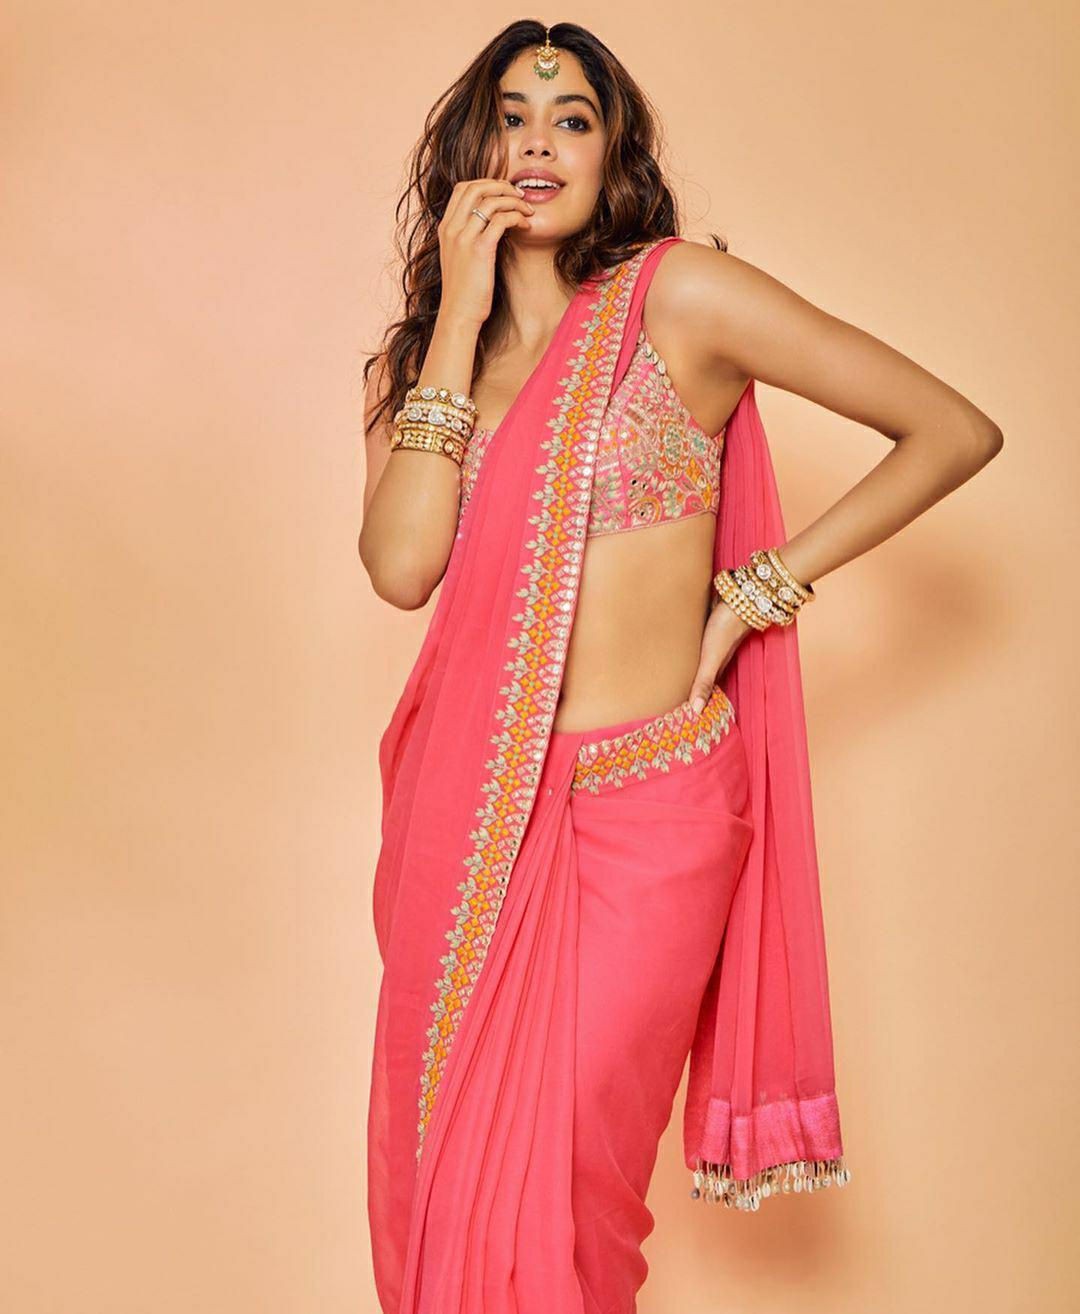 Jhanvi Kapoor in Sizzling Red Bridal Saree